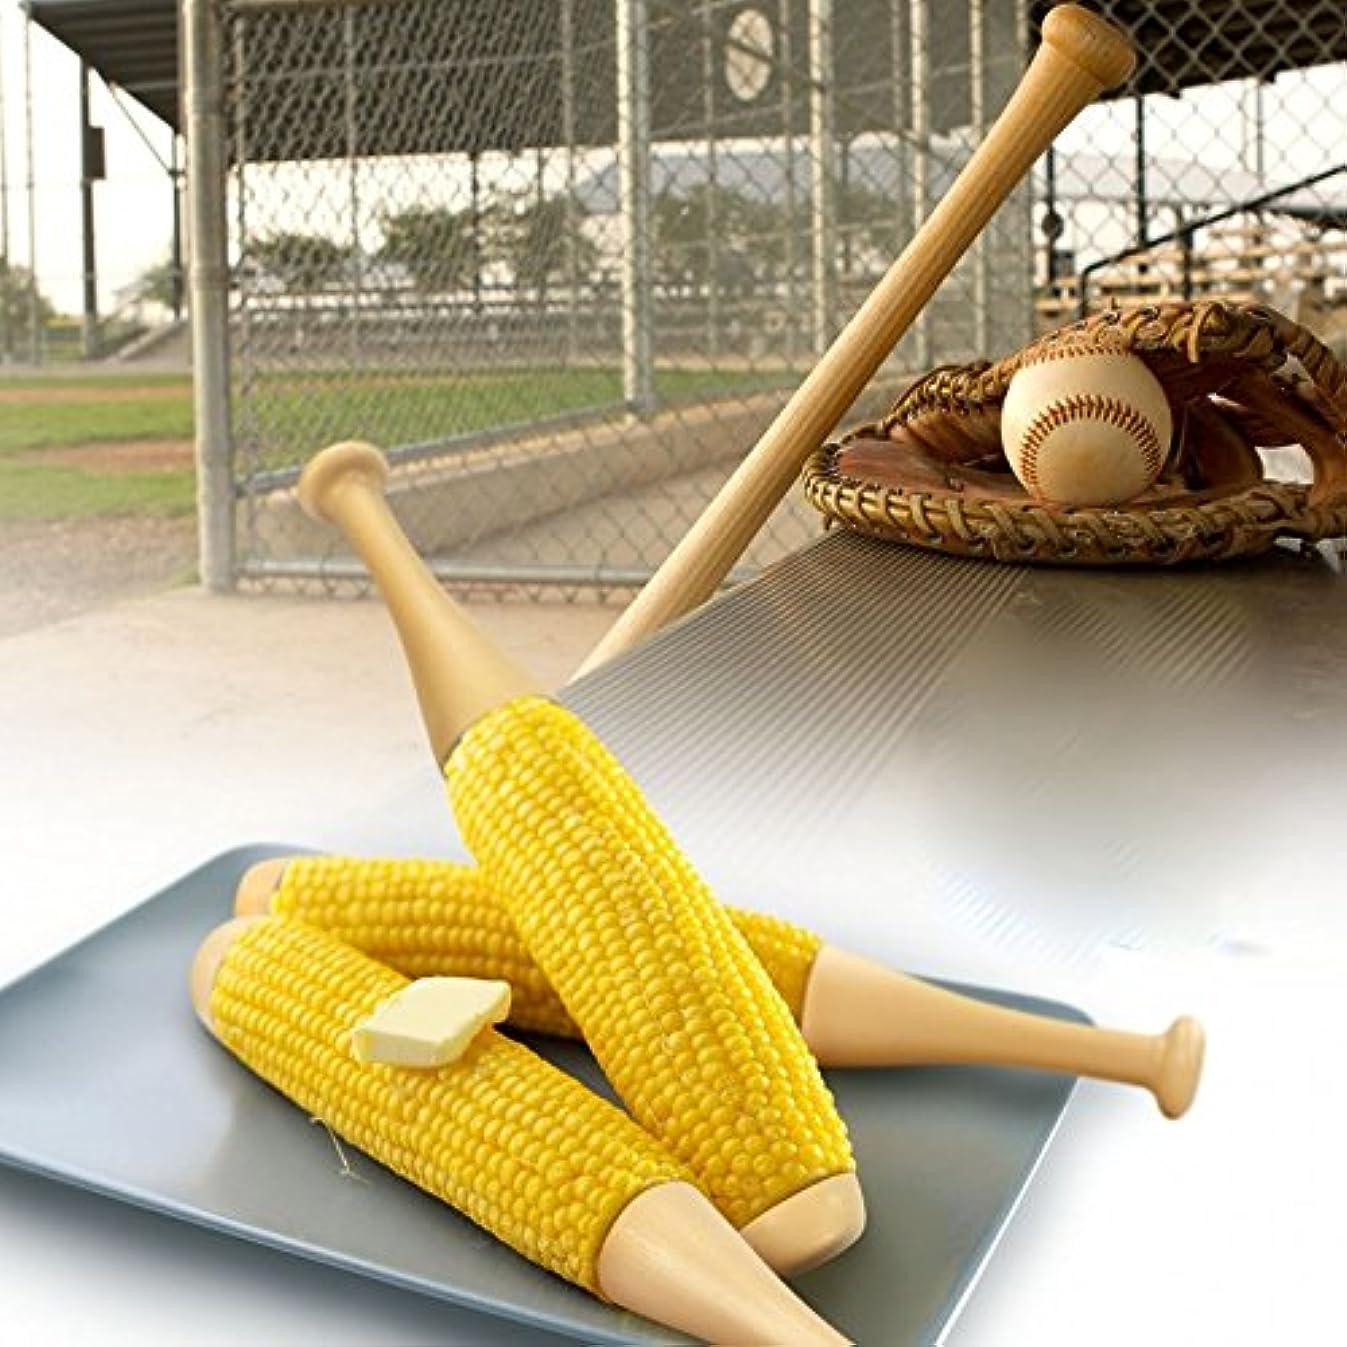 CKB Ltd Set of 2 - Novelty Baseball Bat Corn On The Cob Holder Forks Sticks - Plastic Screw in Design